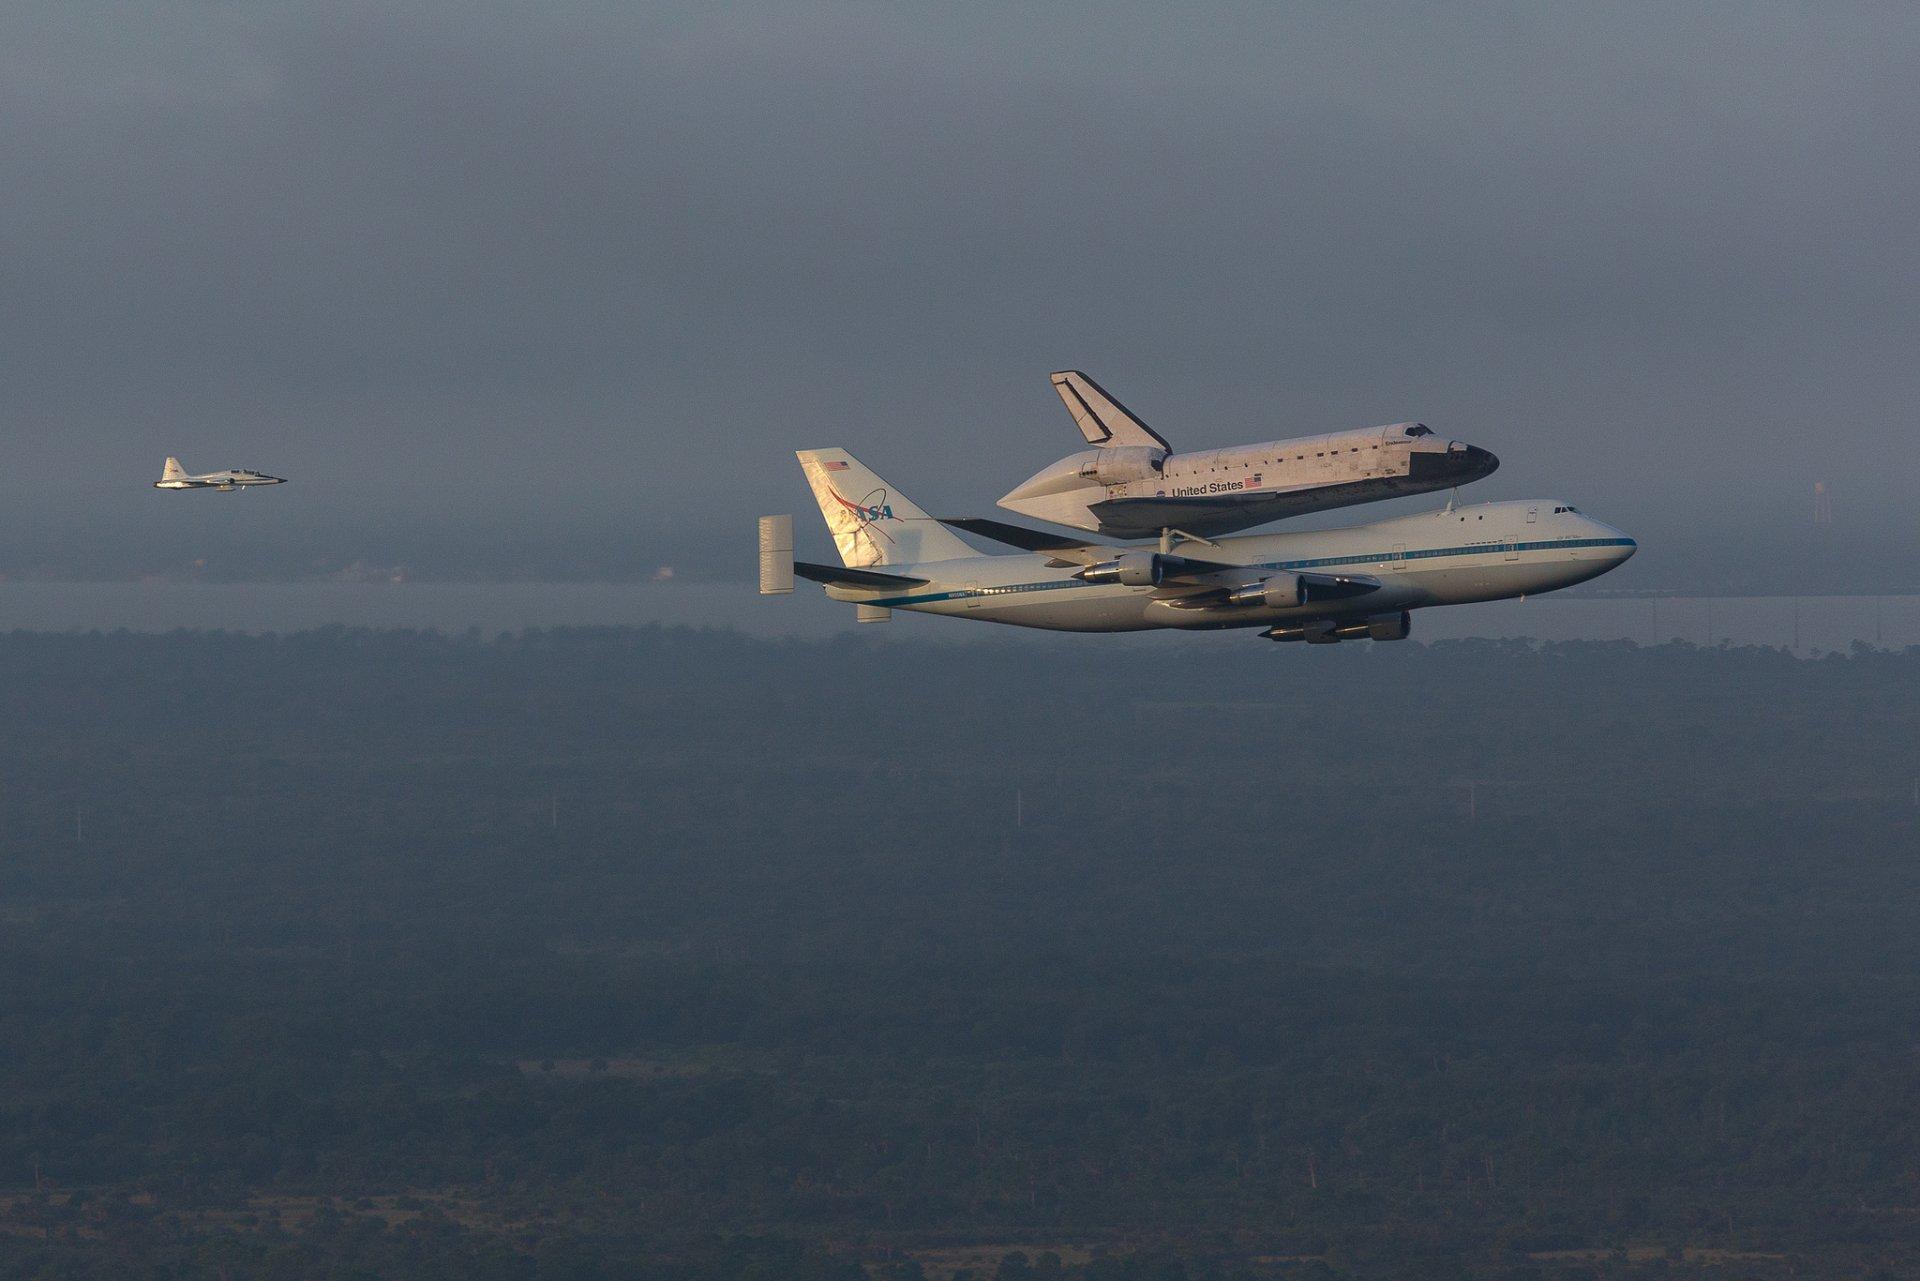 space shuttle endeavour size - photo #36